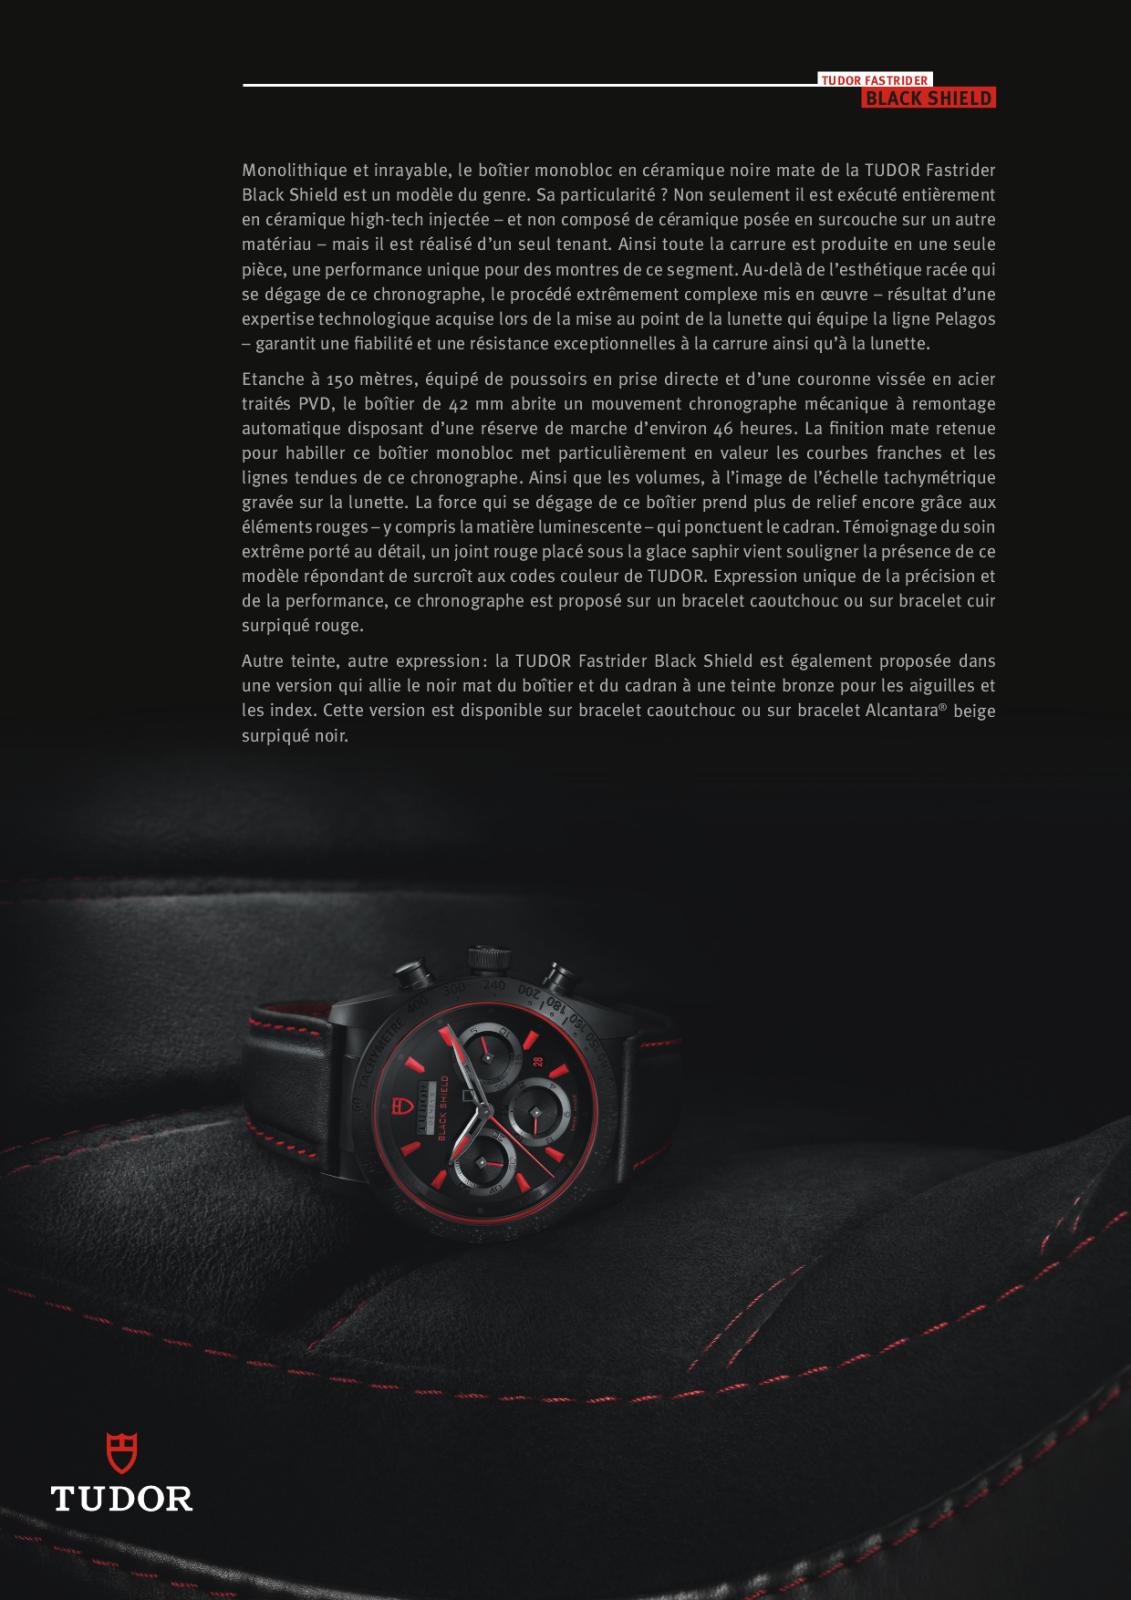 Baselworld 2013: Tudor - Black Shield R0ruxd